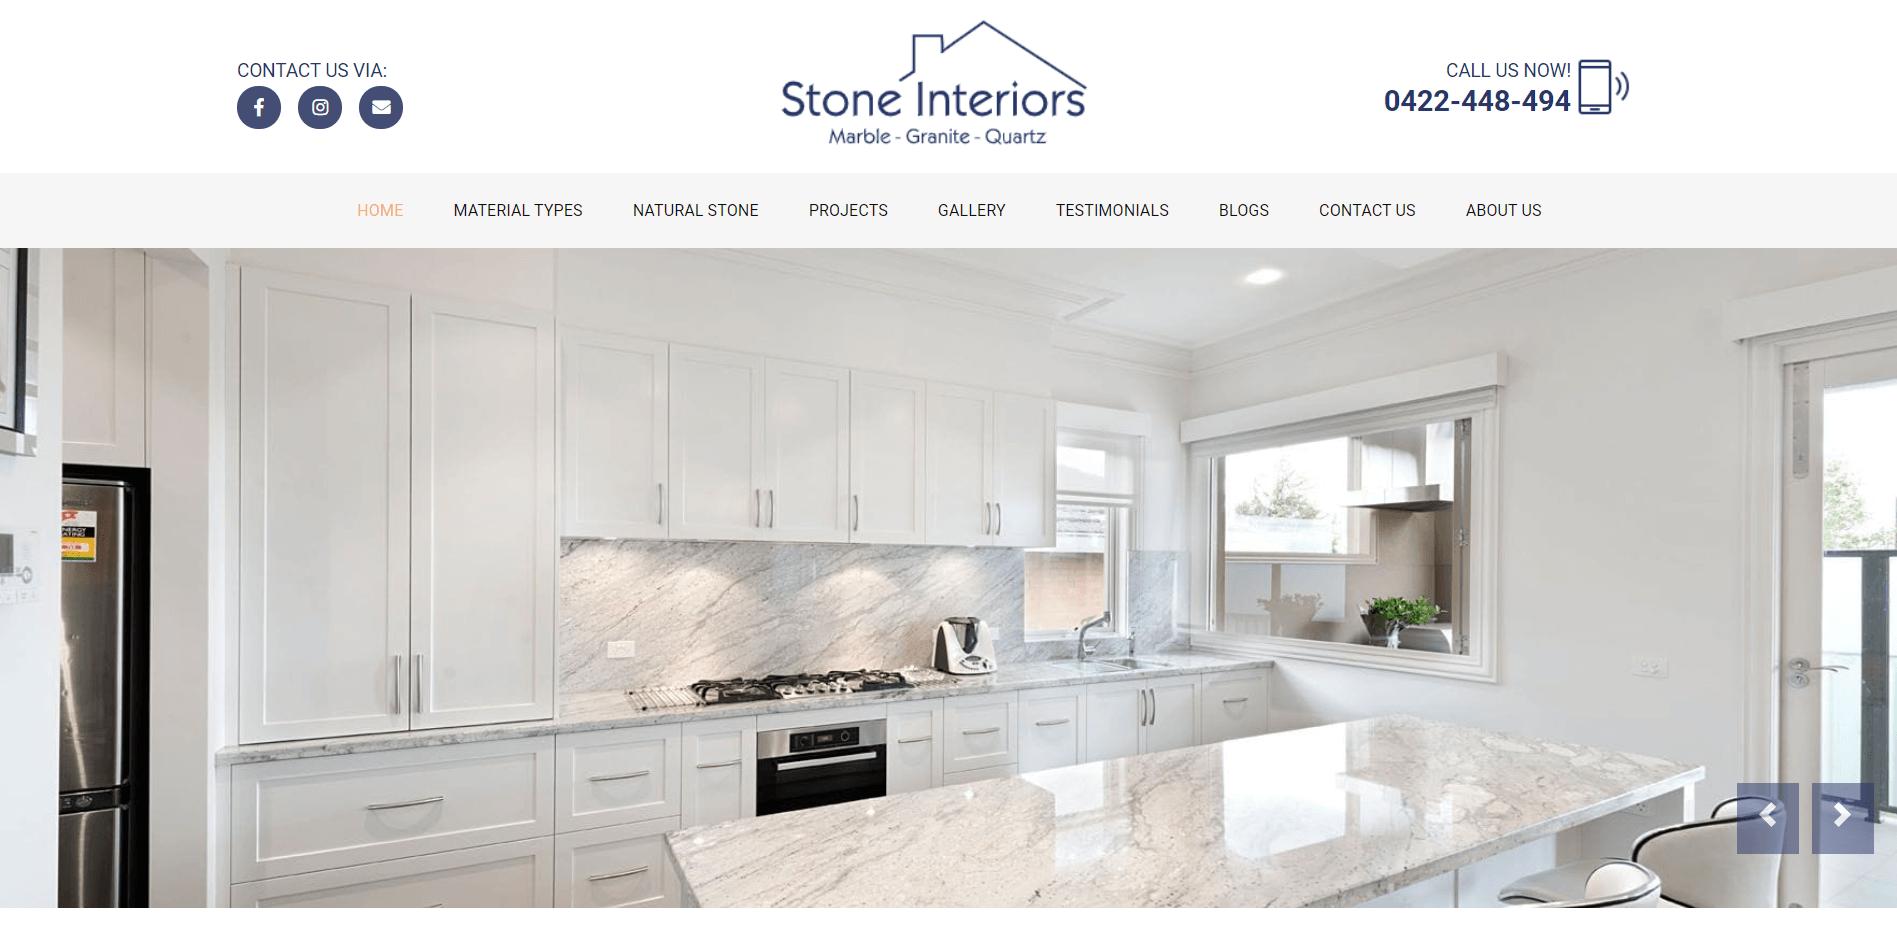 Stone Interiors